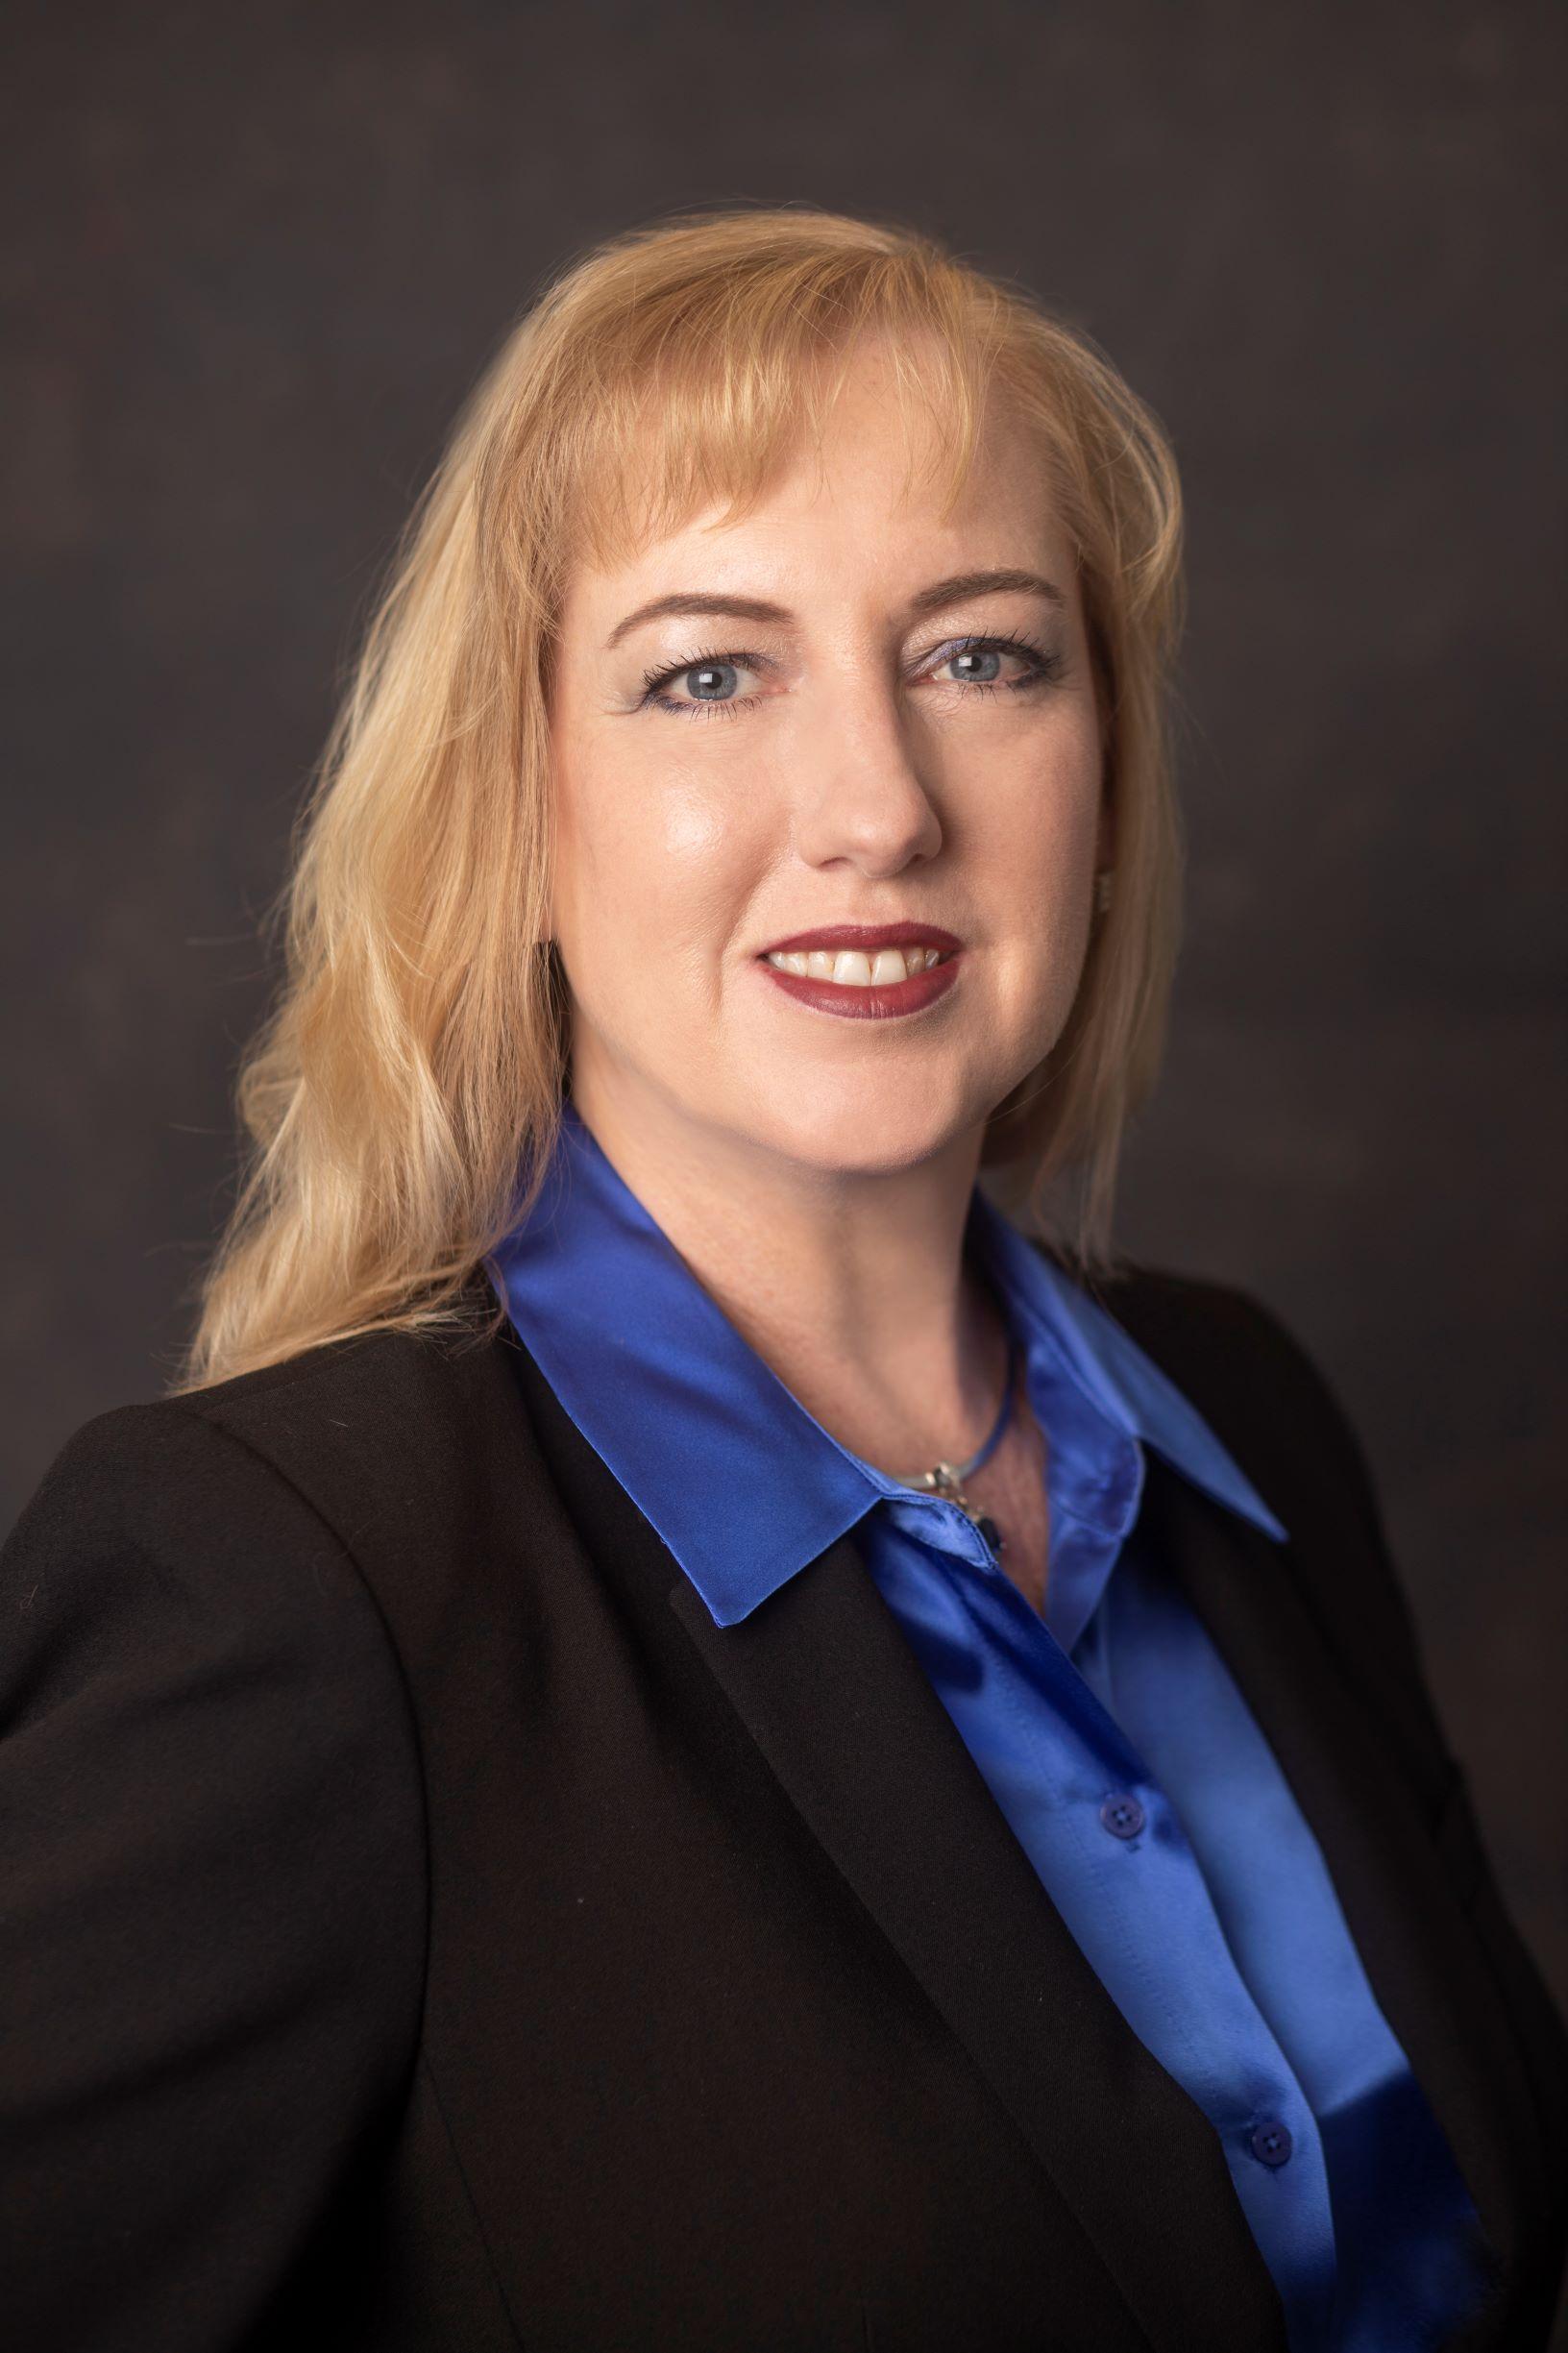 Sharon Greenfield